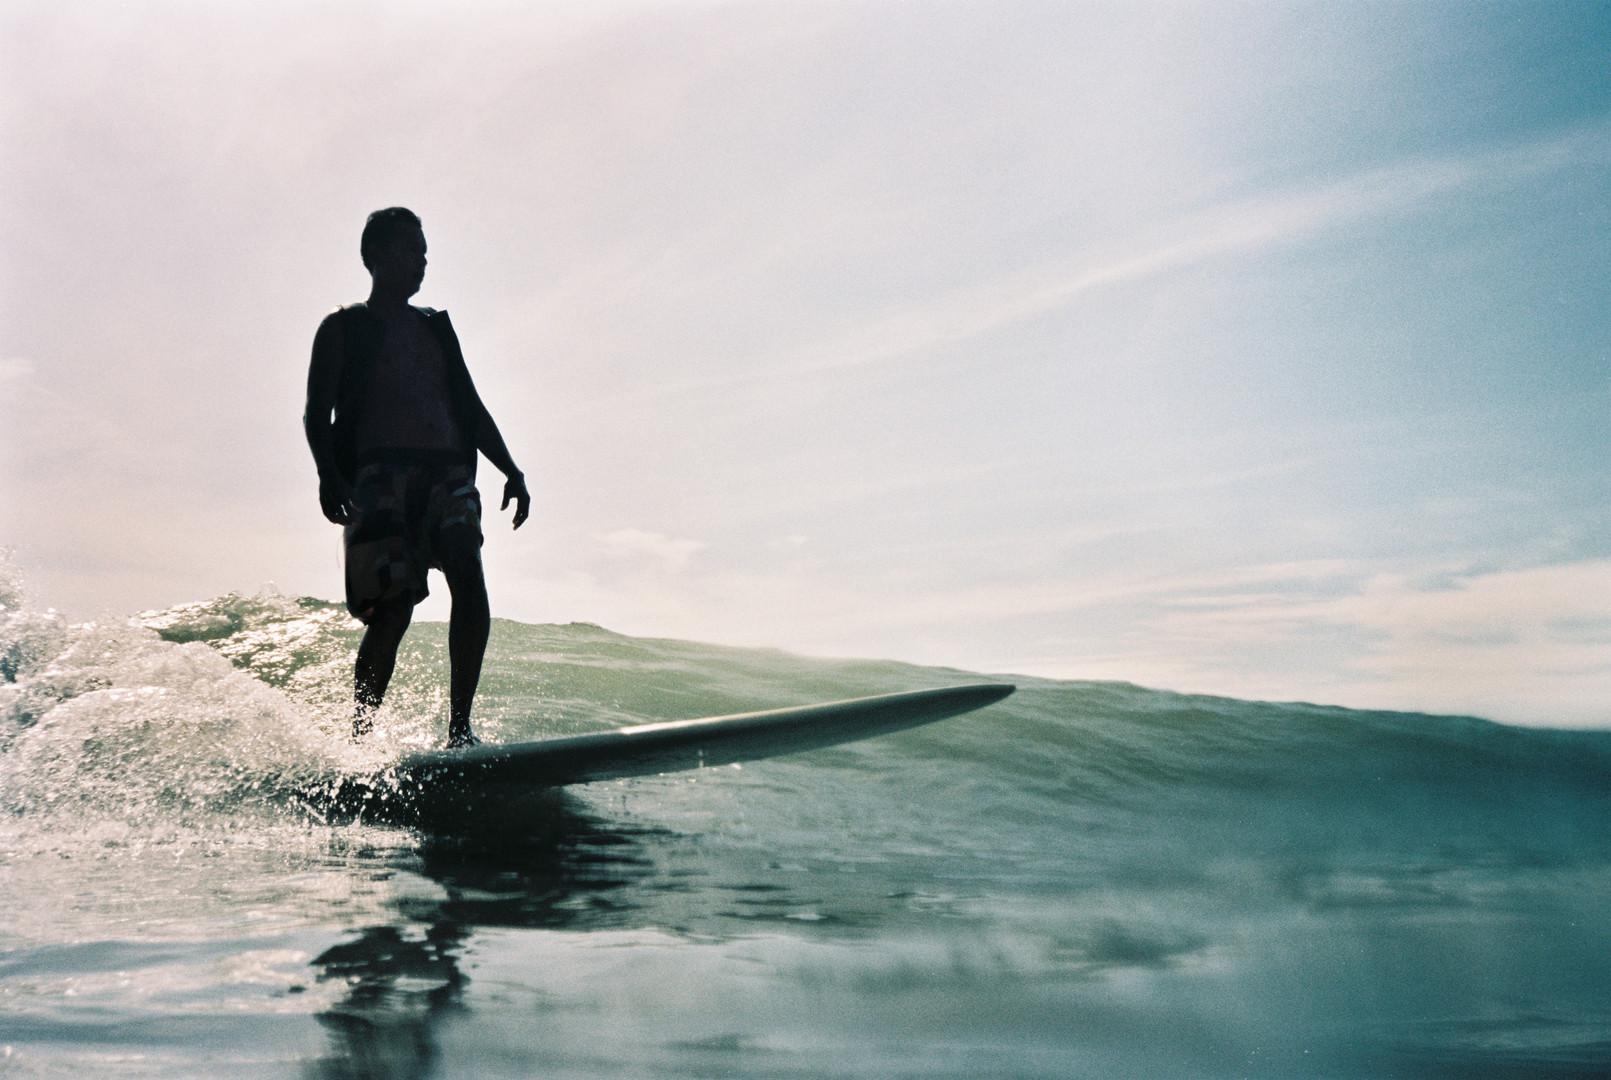 Knee High Surf